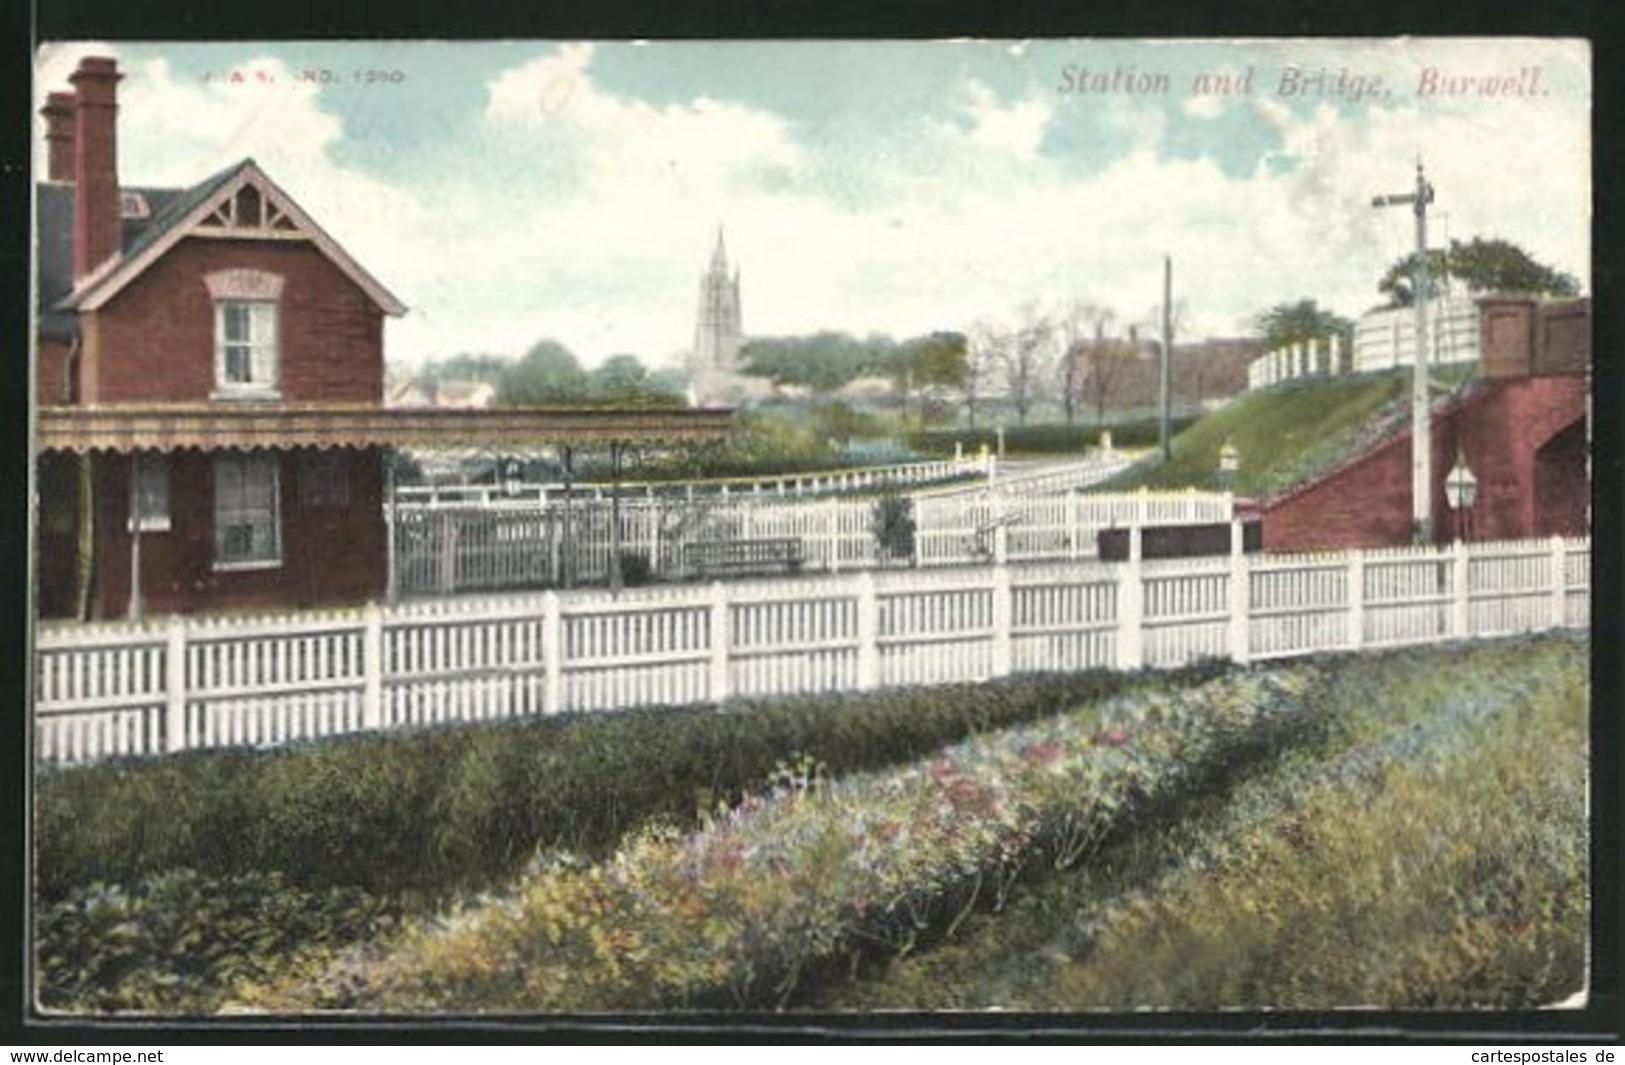 Pc Burwell, Station And Bridge - Non Classés